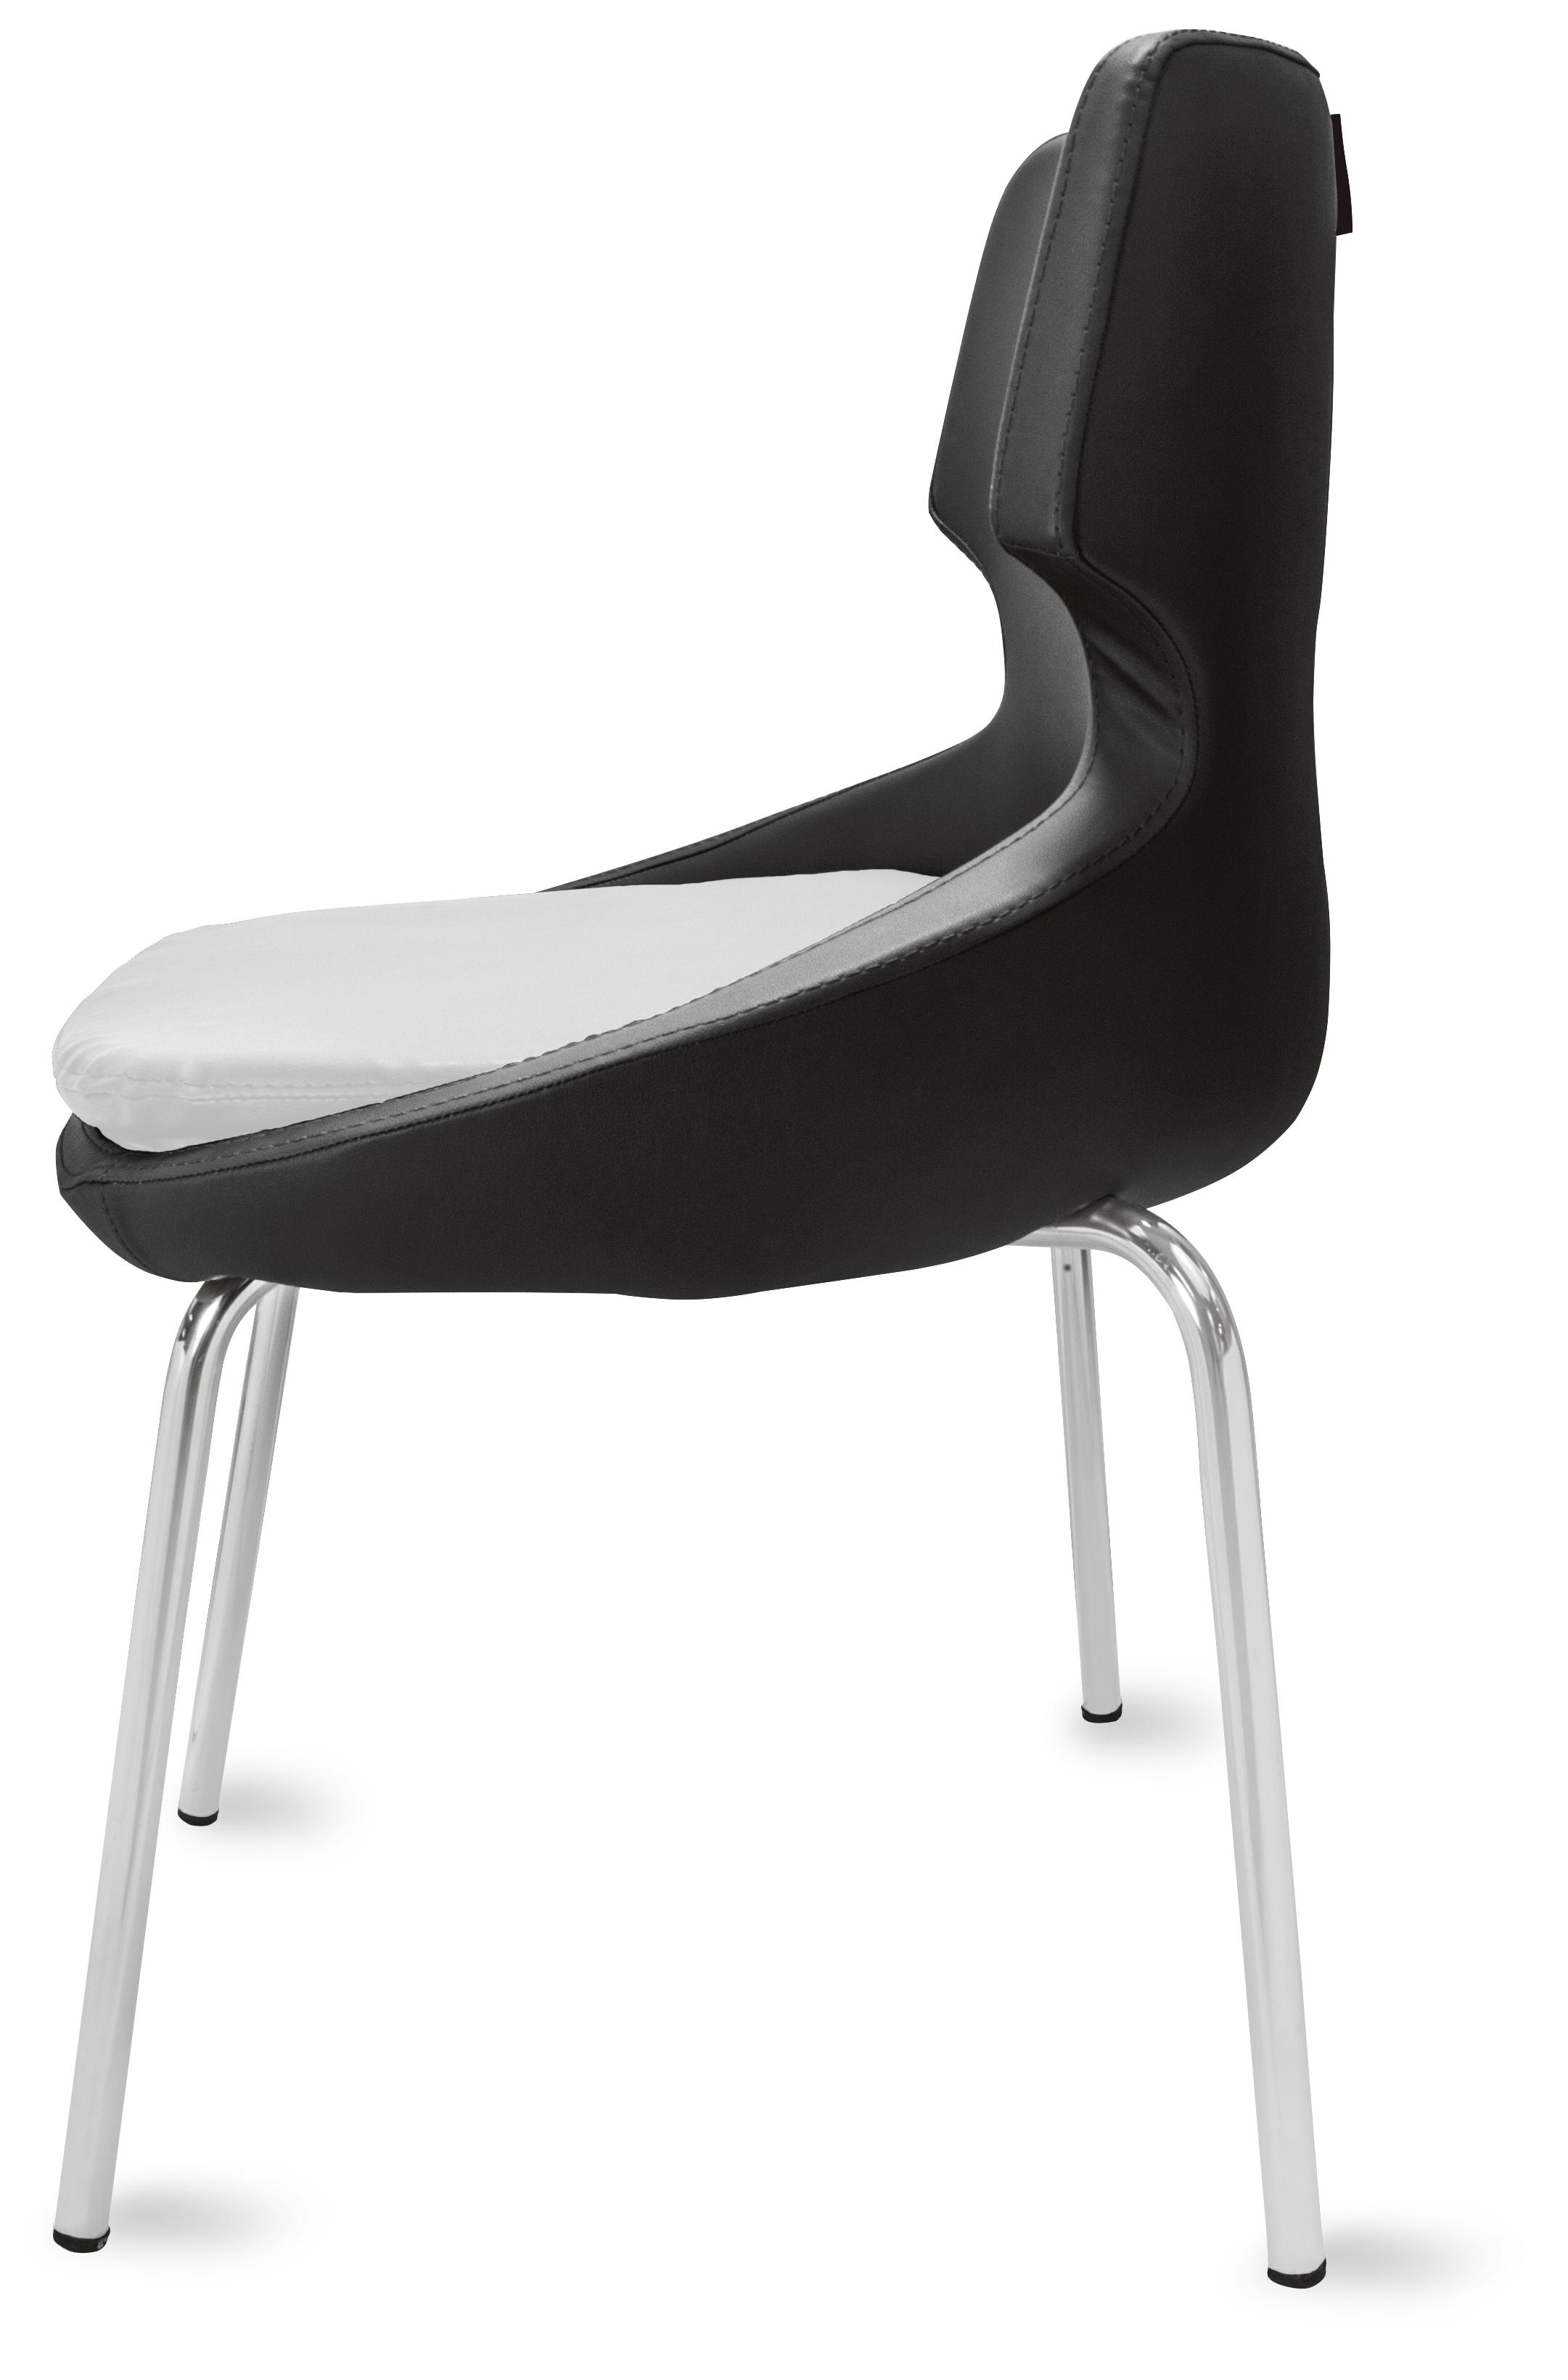 polsterstuhl donna schwarz wei metallf e f r gastronomie. Black Bedroom Furniture Sets. Home Design Ideas